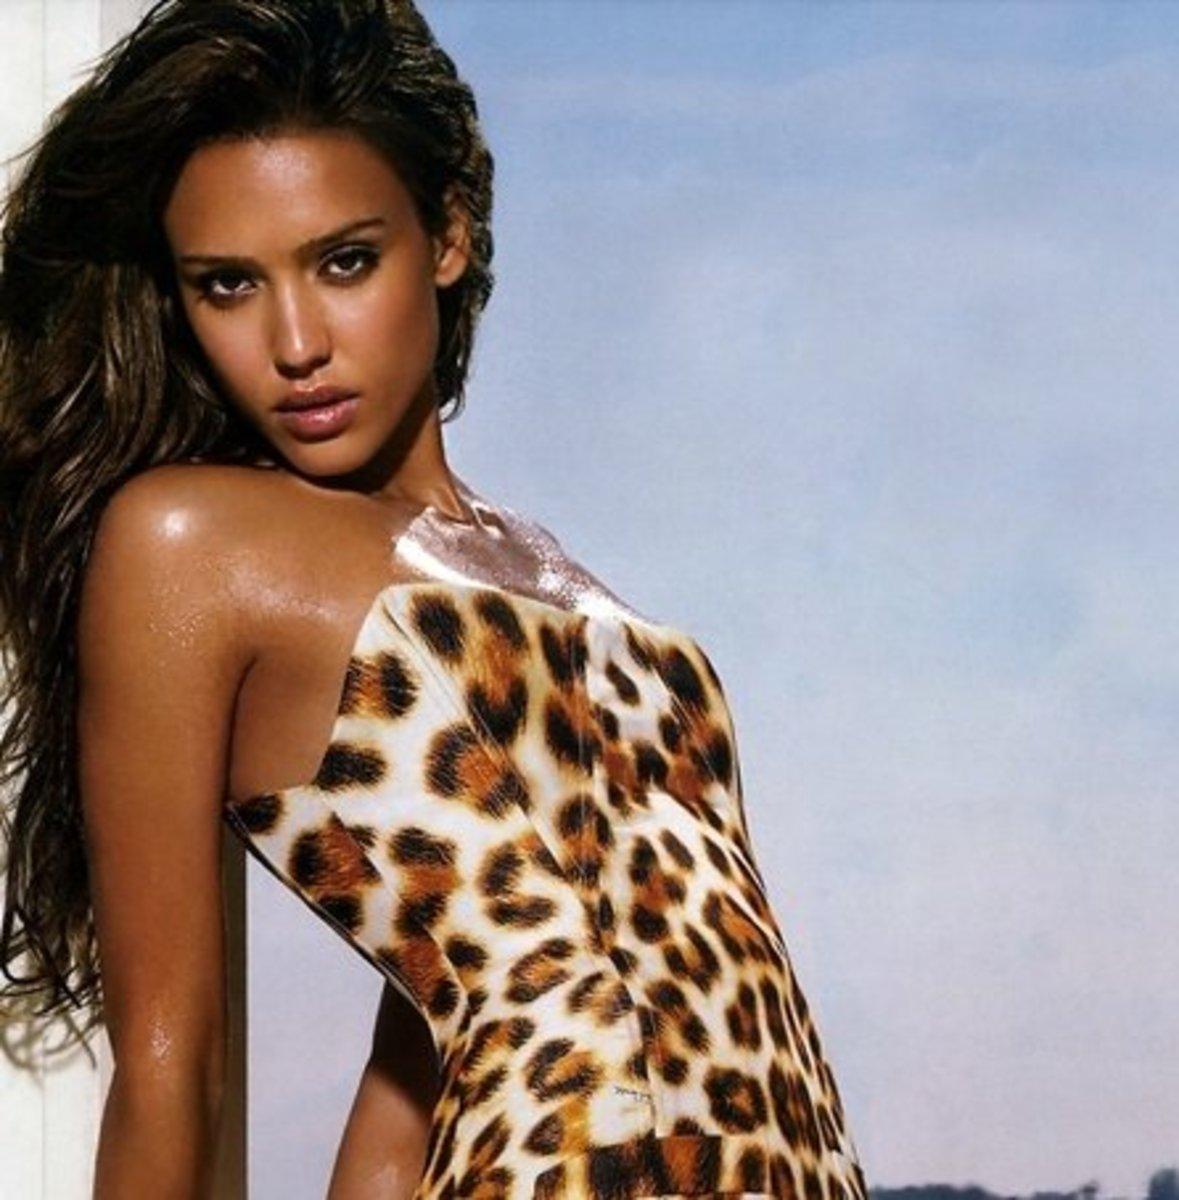 Beautiful Native American Women 2